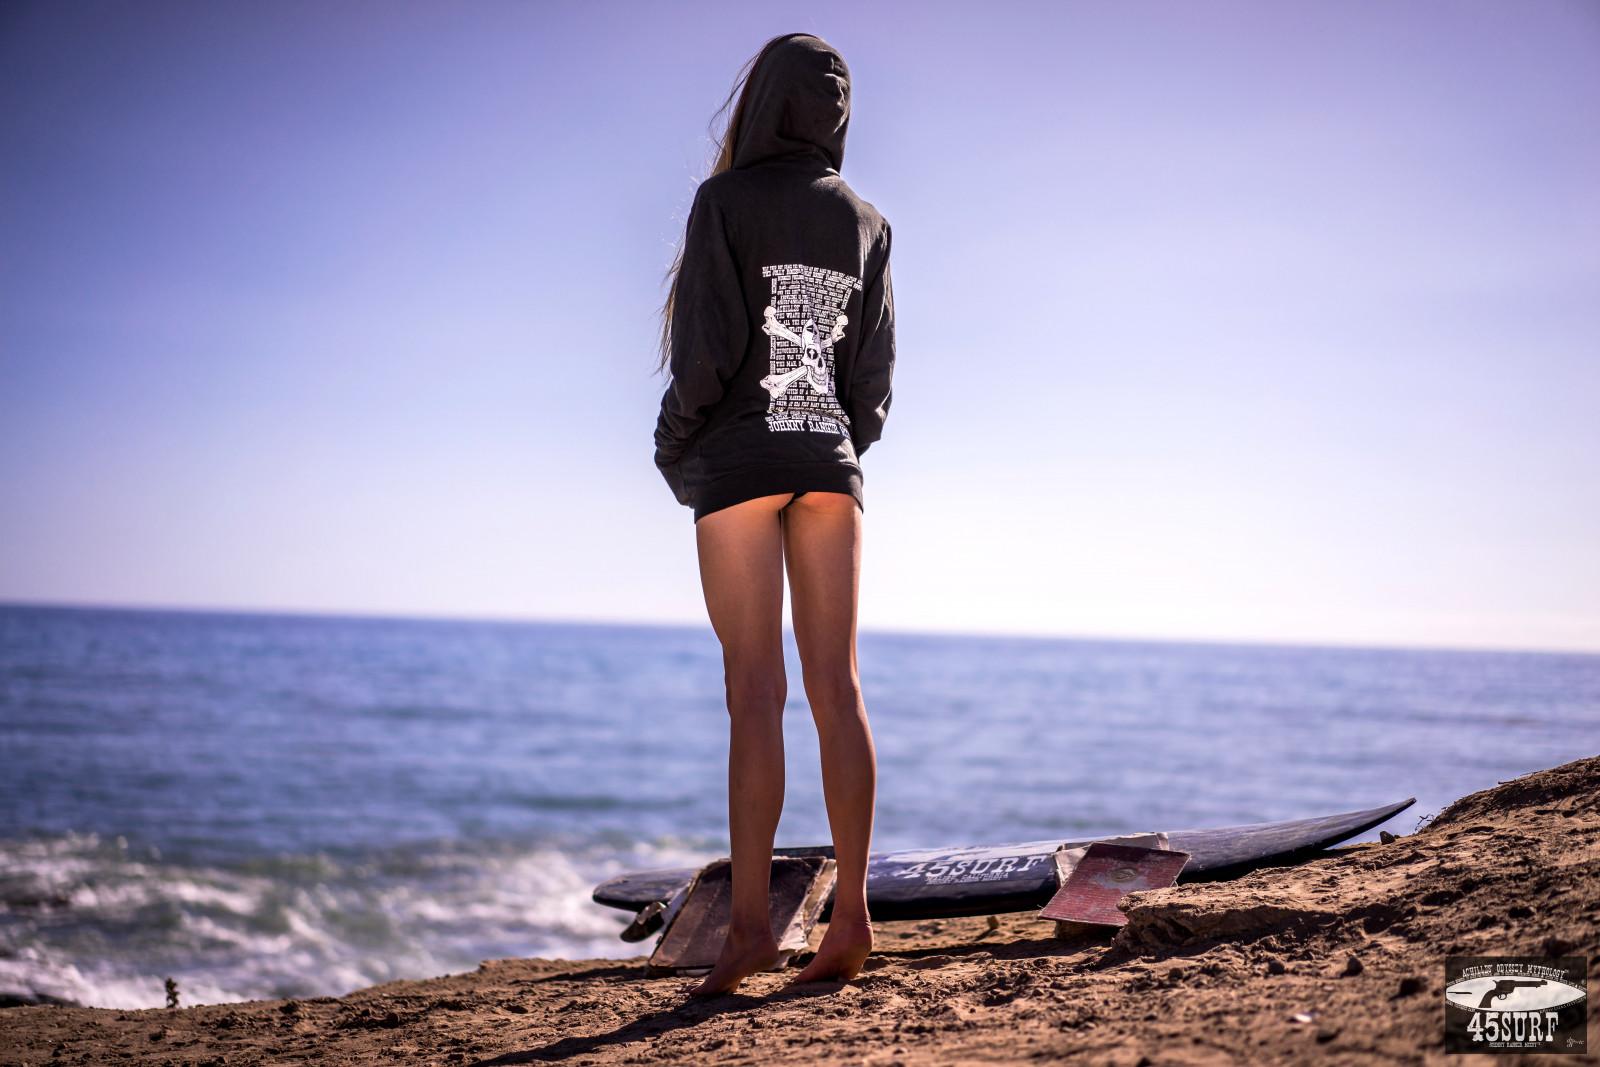 Wallpaper : sunlight, women outdoors, sea, sand, brunette